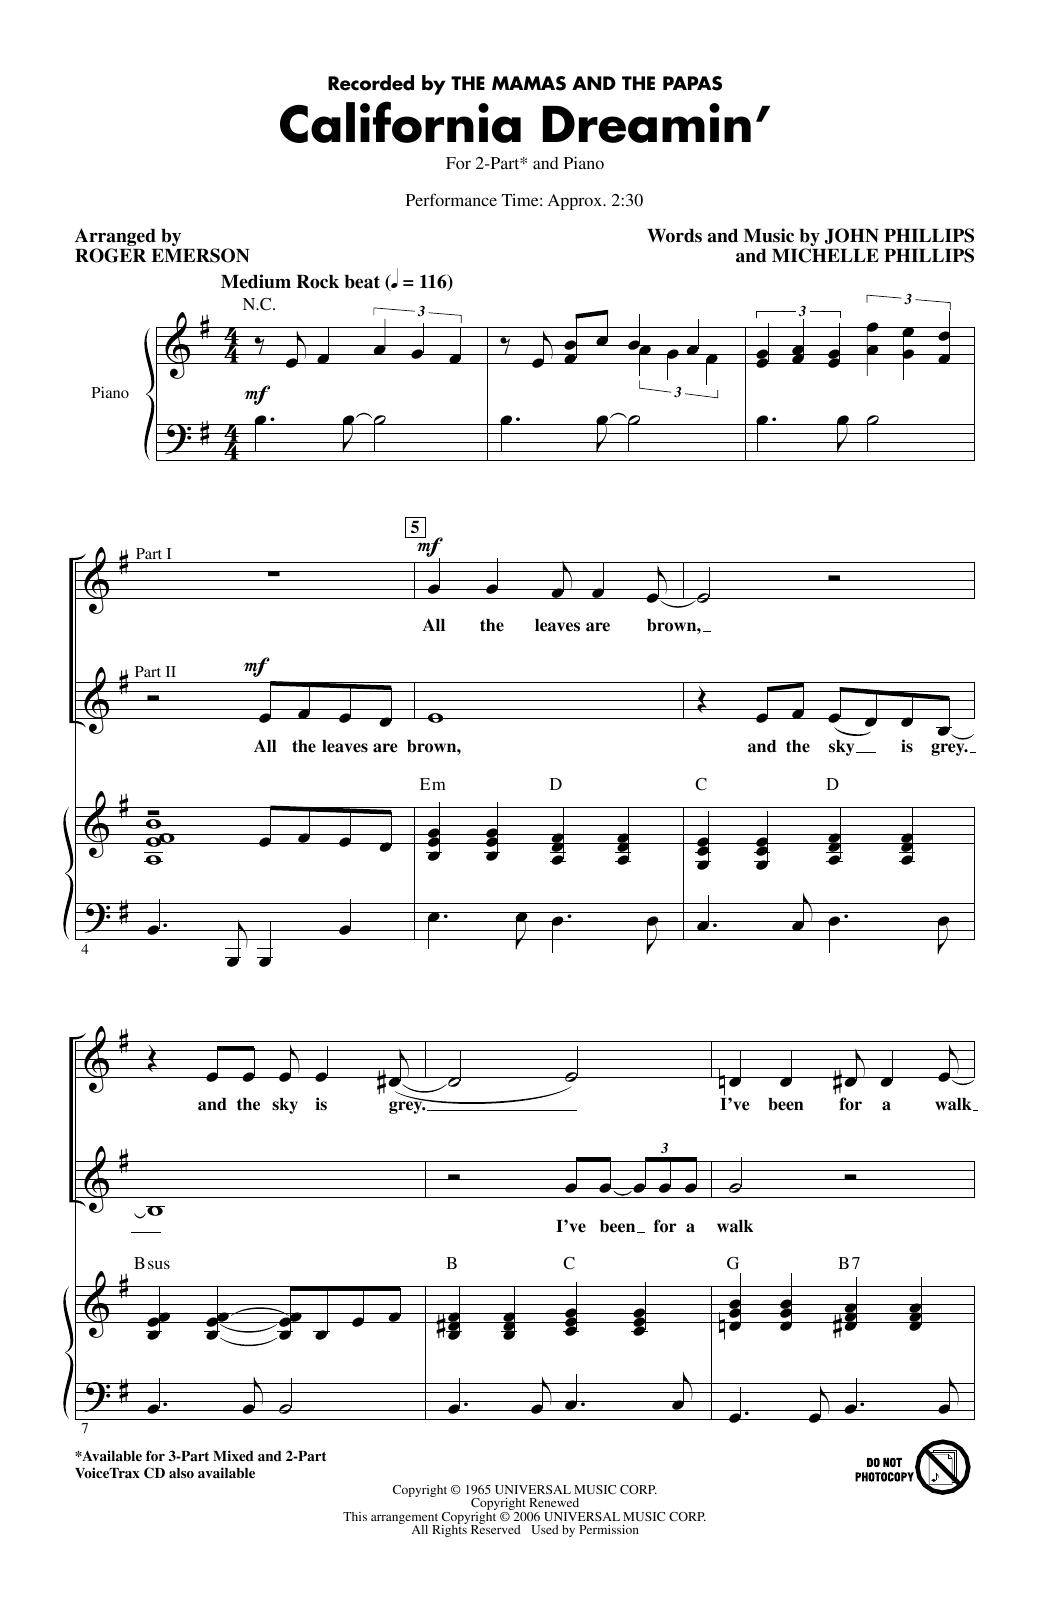 California Dreamin' (arr. Roger Emerson) Sheet Music